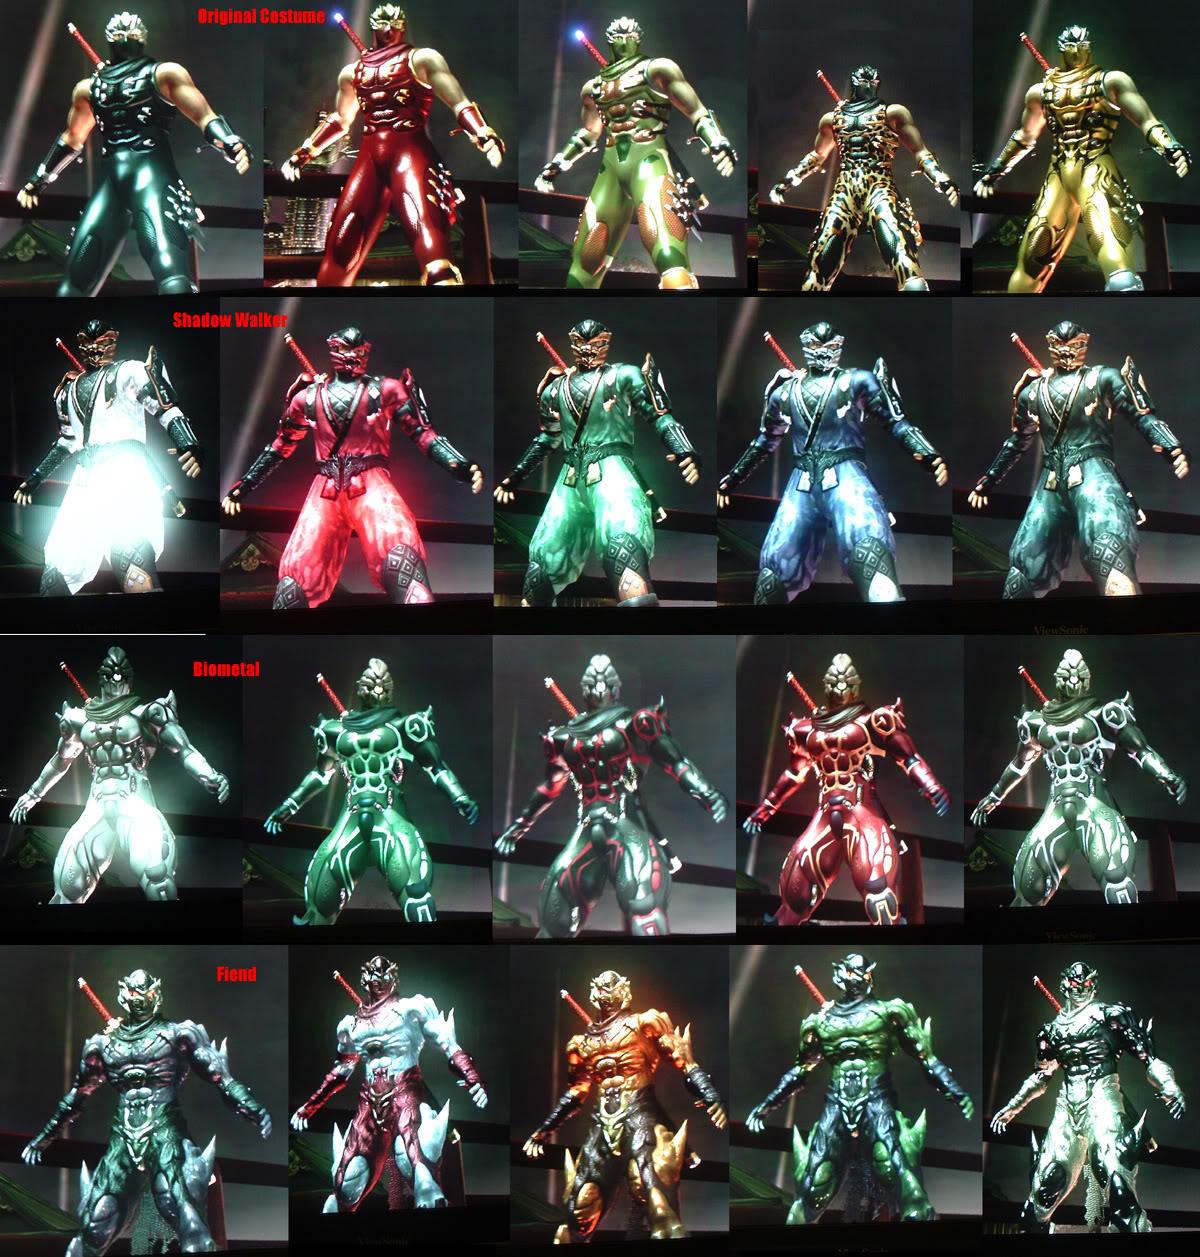 Ninja Gaiden 2 Halo Costume And Prop Maker Community 405th